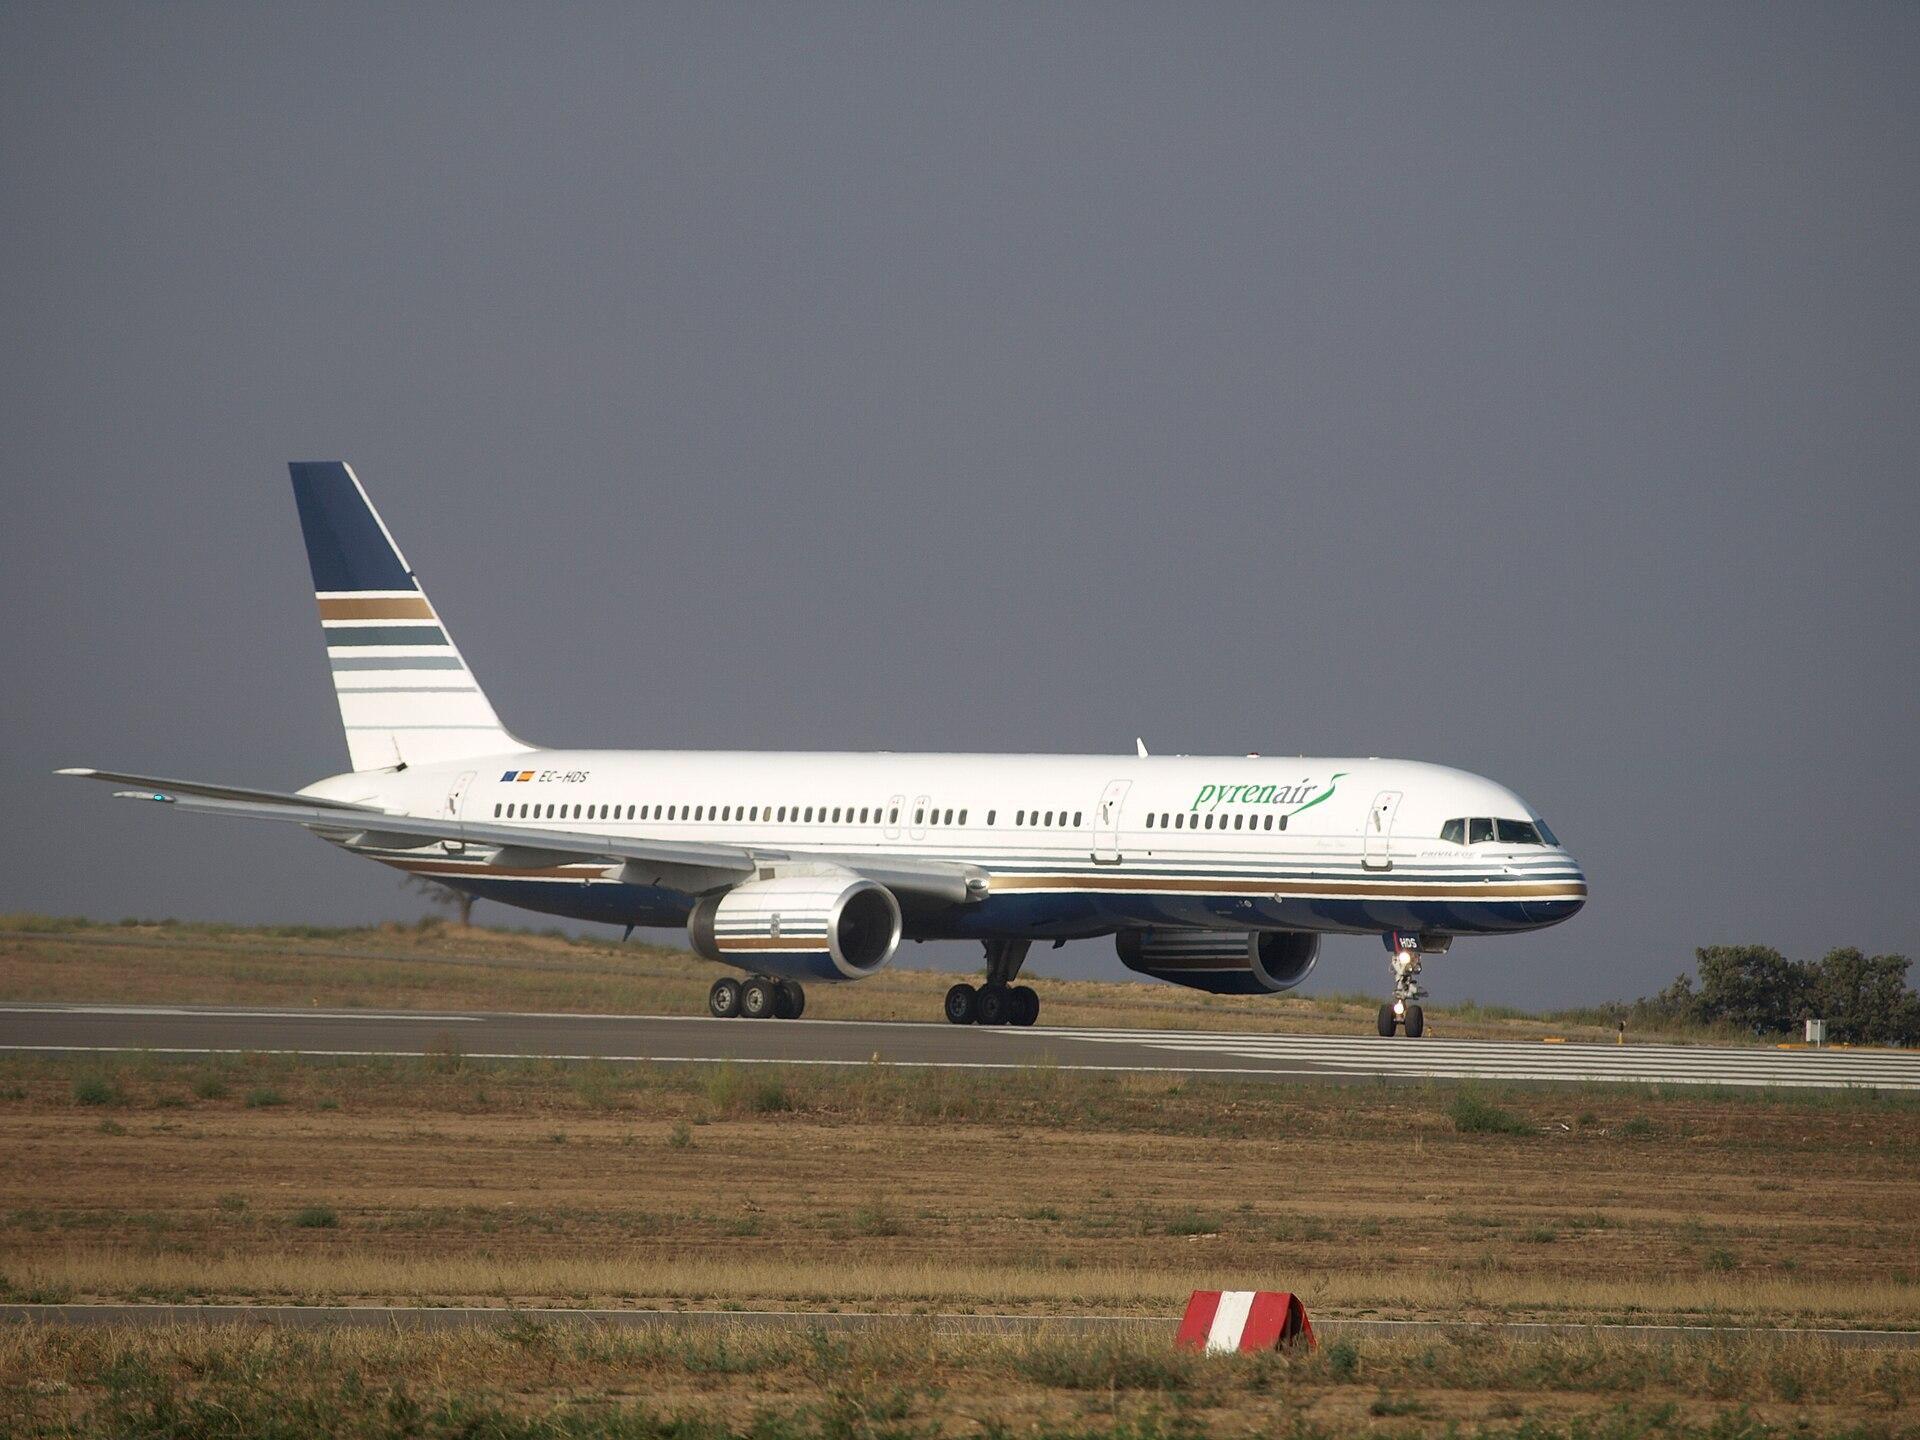 Huesca - Aeropuerto Huesca - Pirineos - Primer aterrizaje.jpg